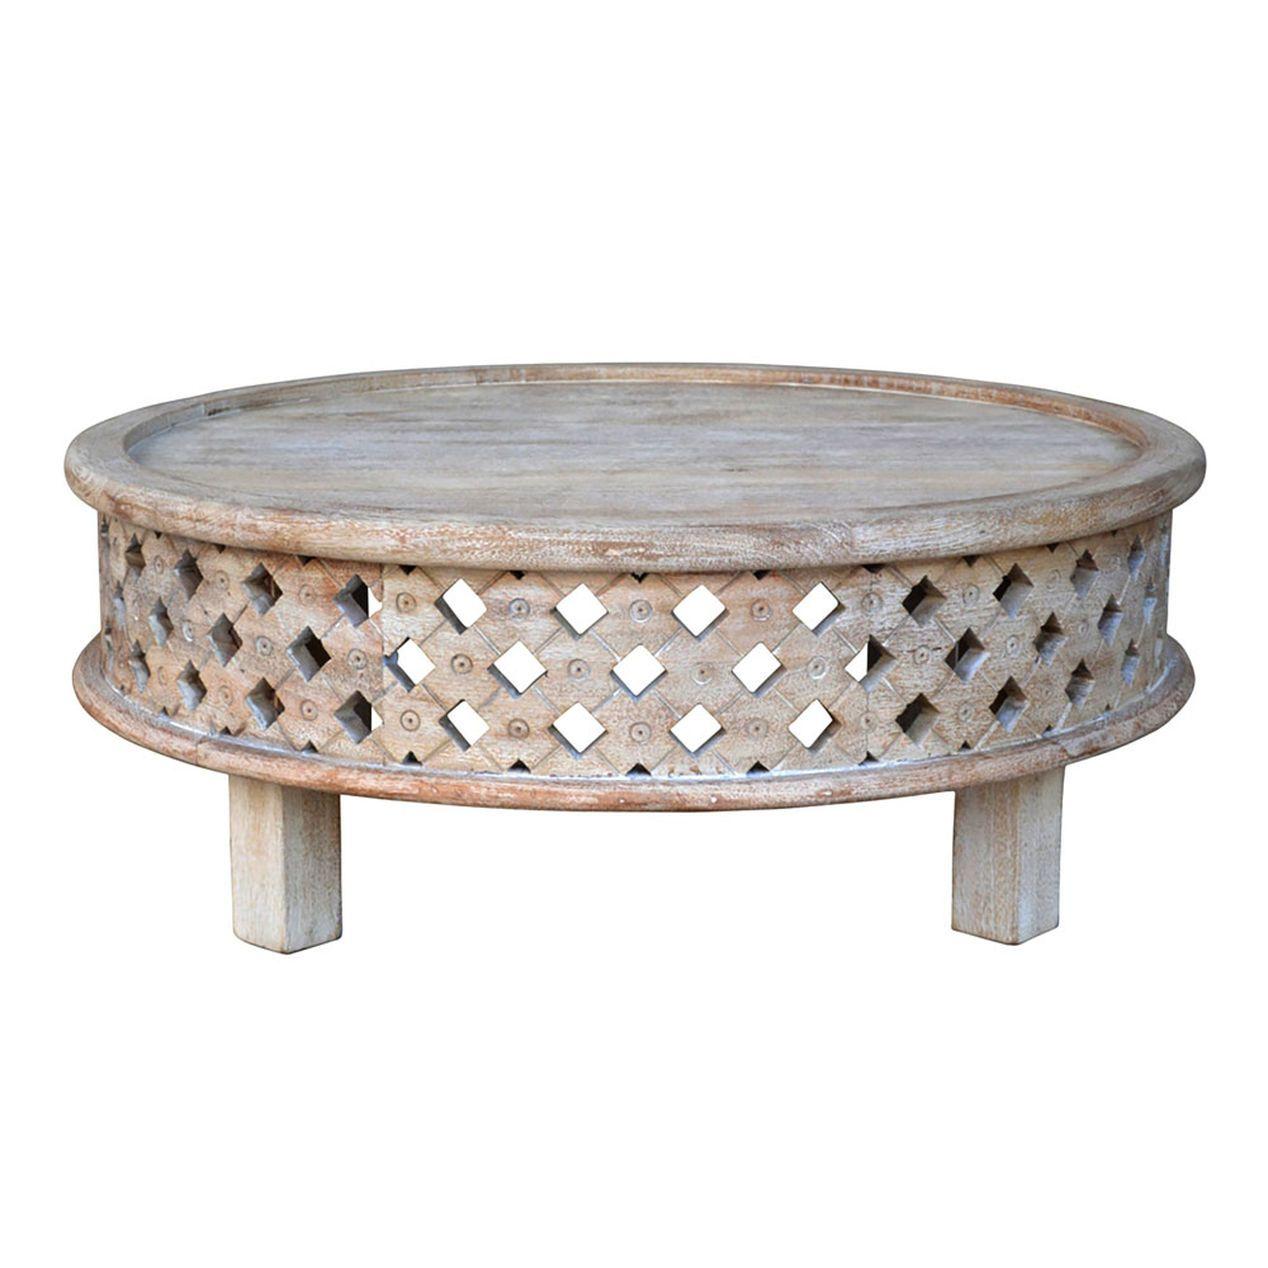 Bargu Mango Wood Round Coffee Table Round Coffee Table Round Wood Coffee Table Coffee Table [ 1268 x 1268 Pixel ]